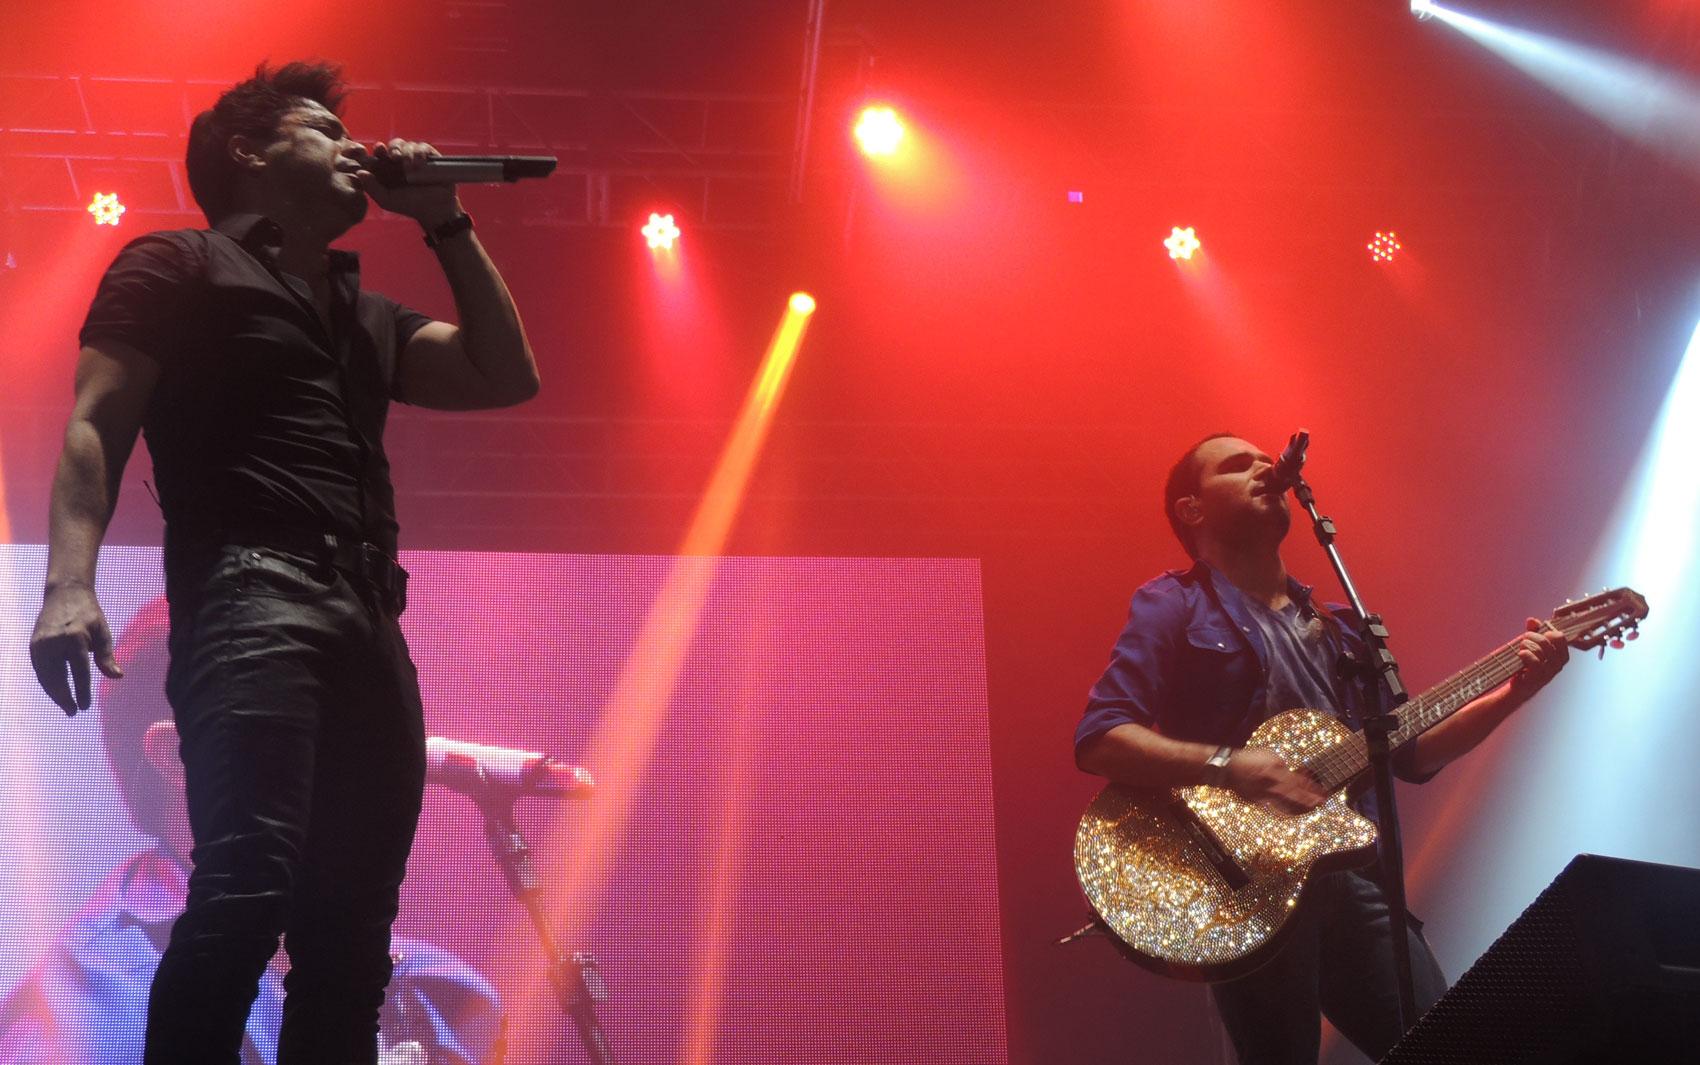 A dupla Zezé di Camargo e Luciano arrancou gritos e lágrimas de fãs apaixonadas.